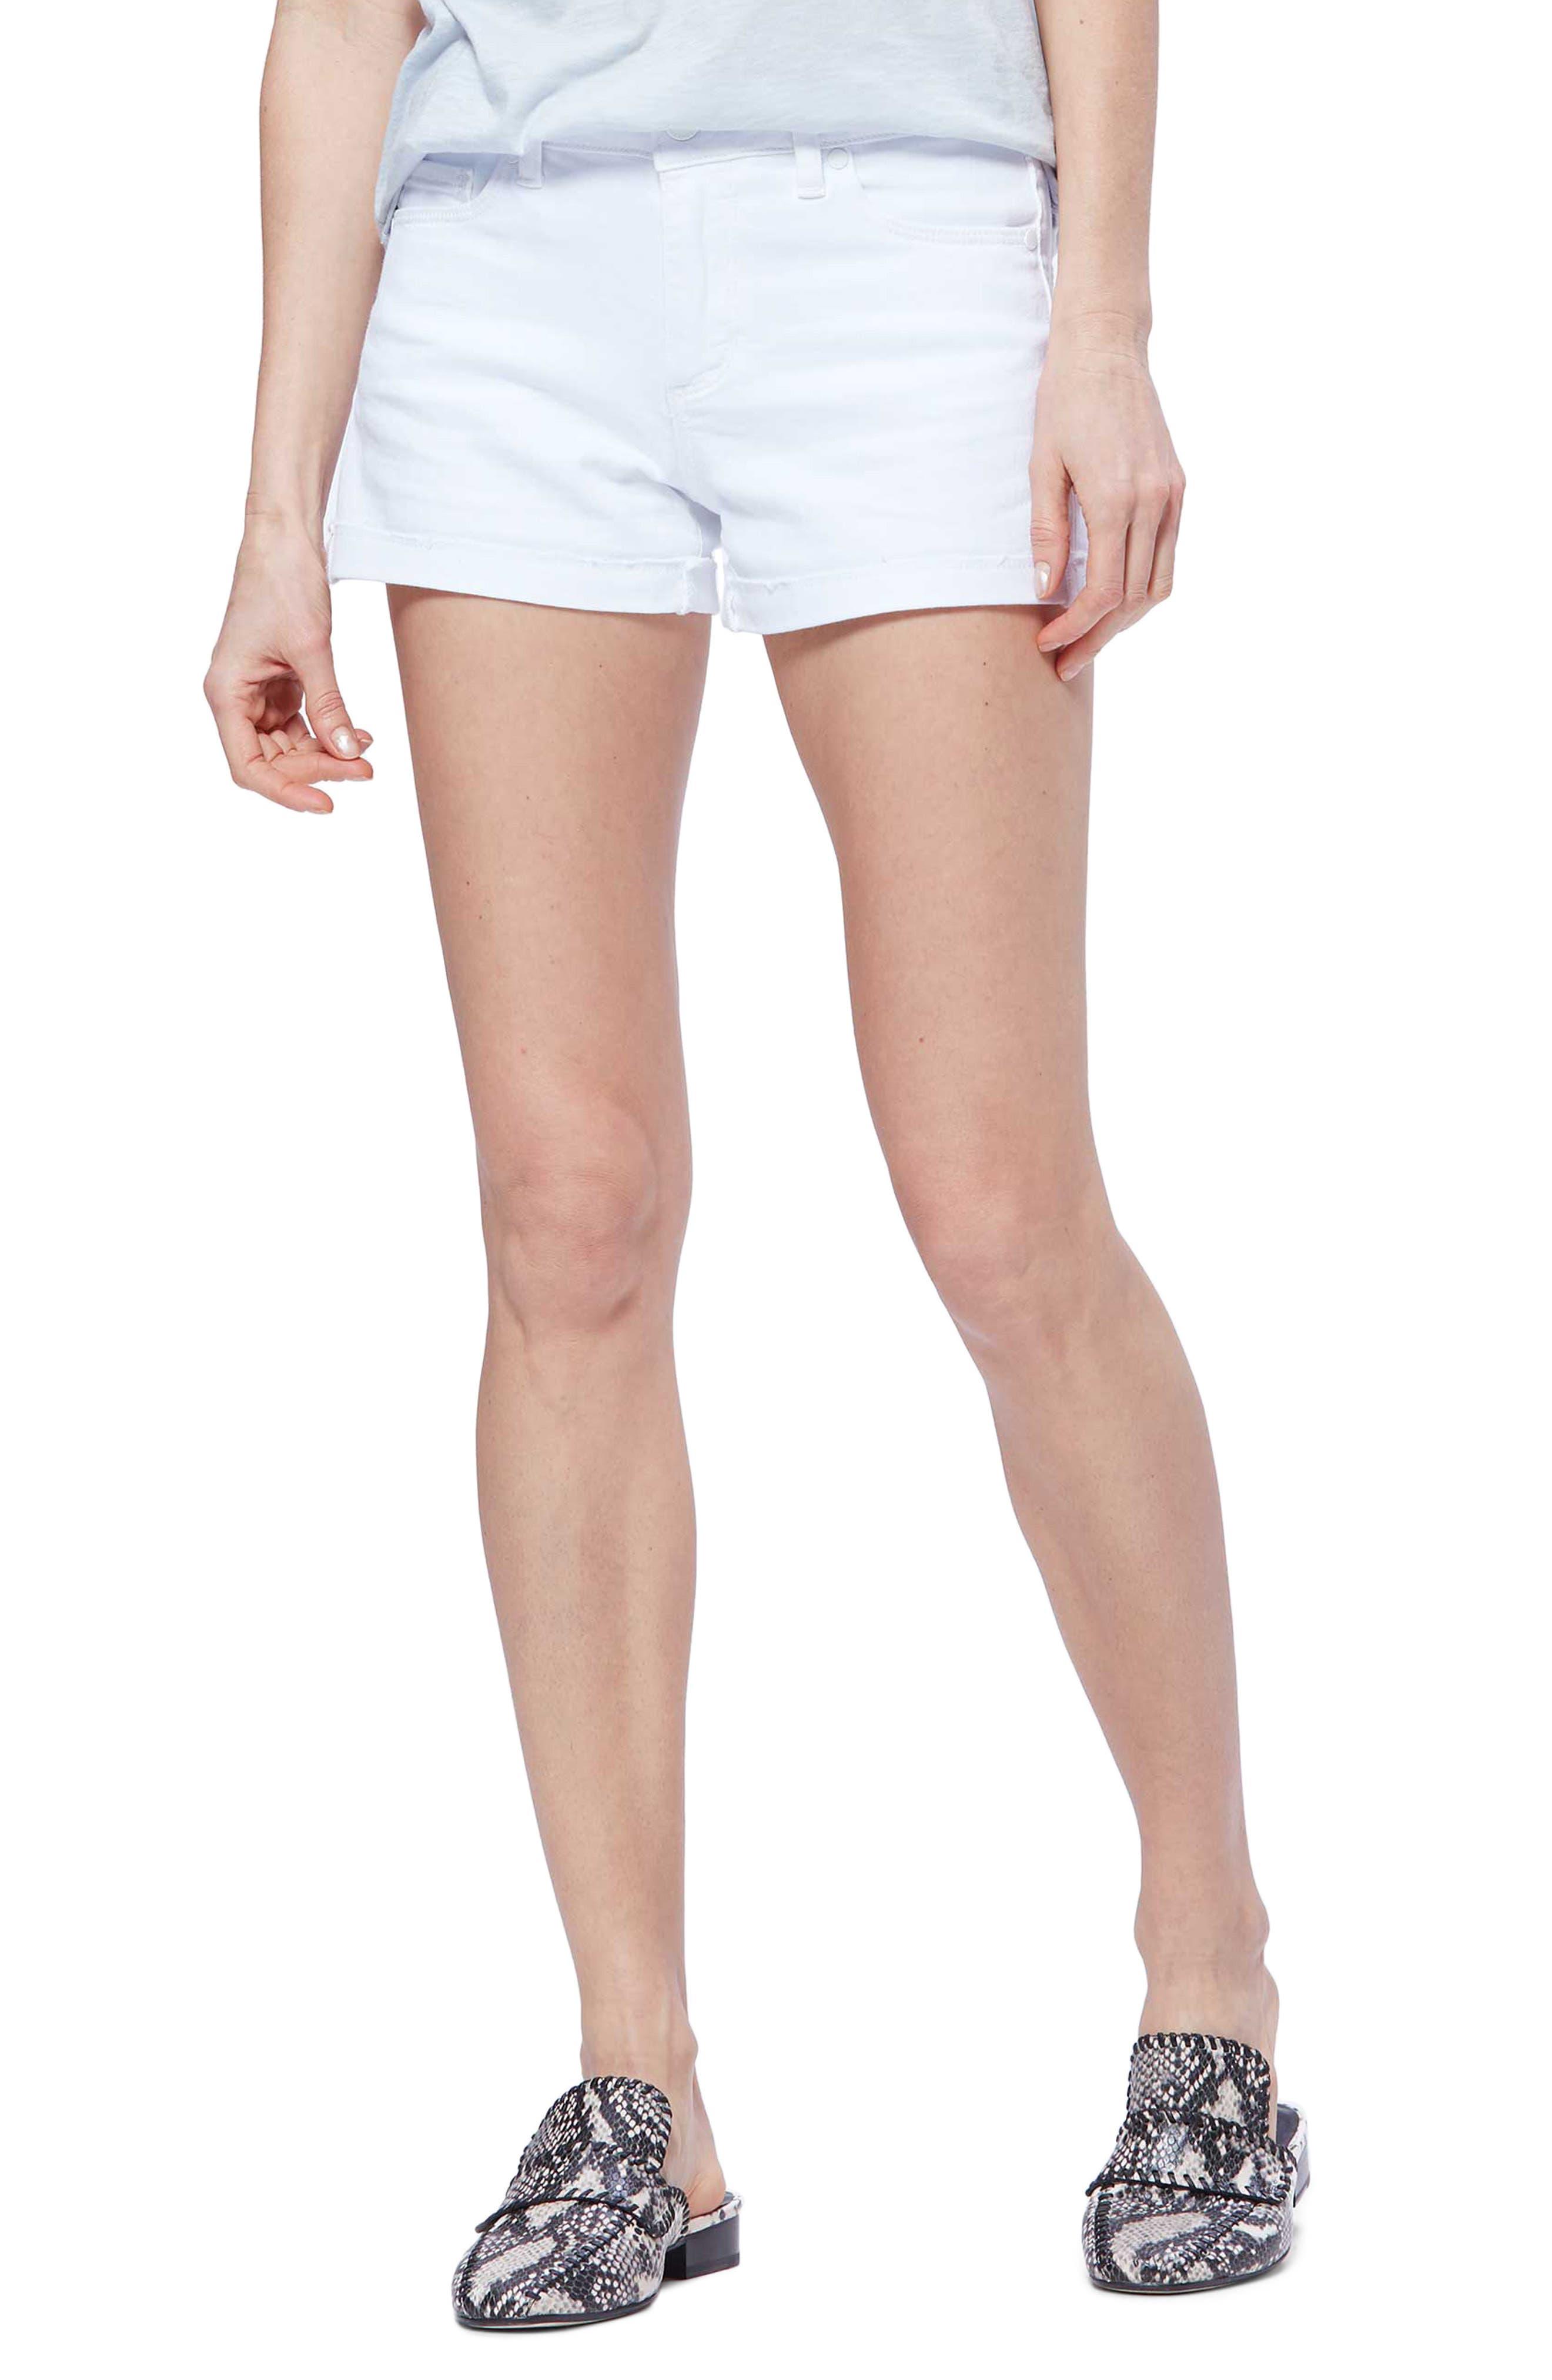 Women's Paige Jimmy Jimmy High Waist Denim Shorts